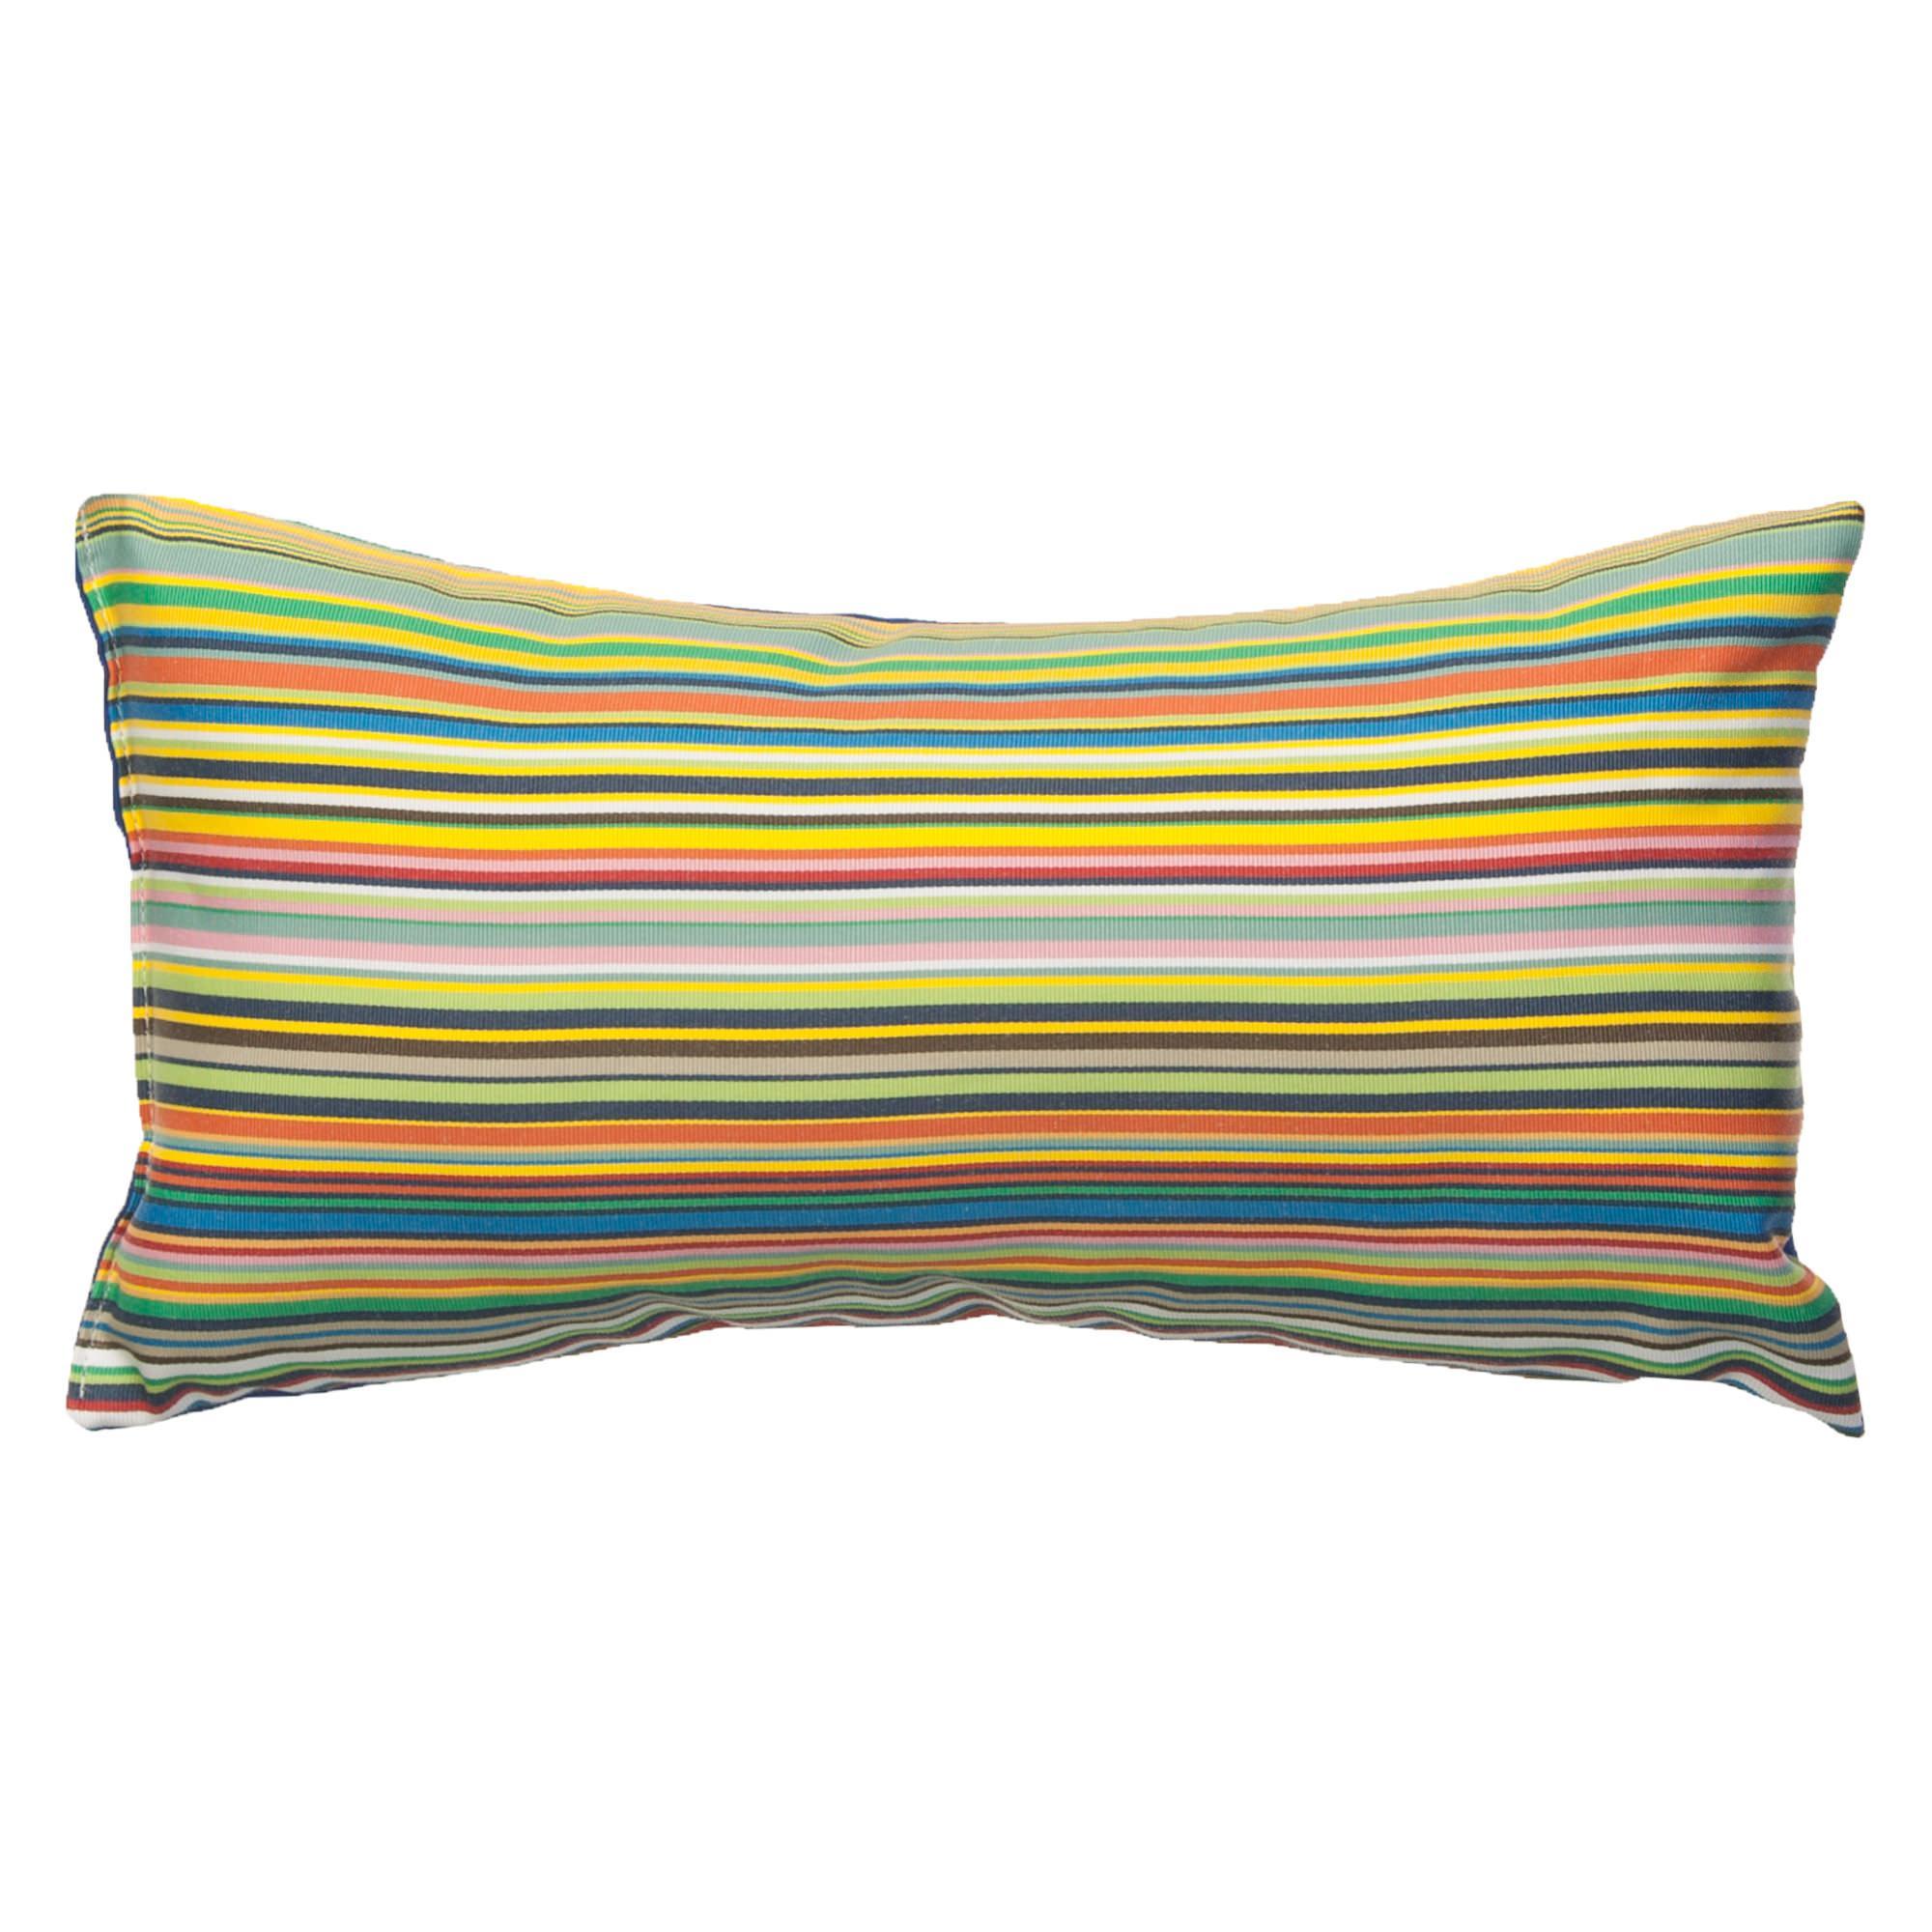 Shop Big Sur Outdoor Throw Pillow 19 In X 10 In Rectangle Lumbar